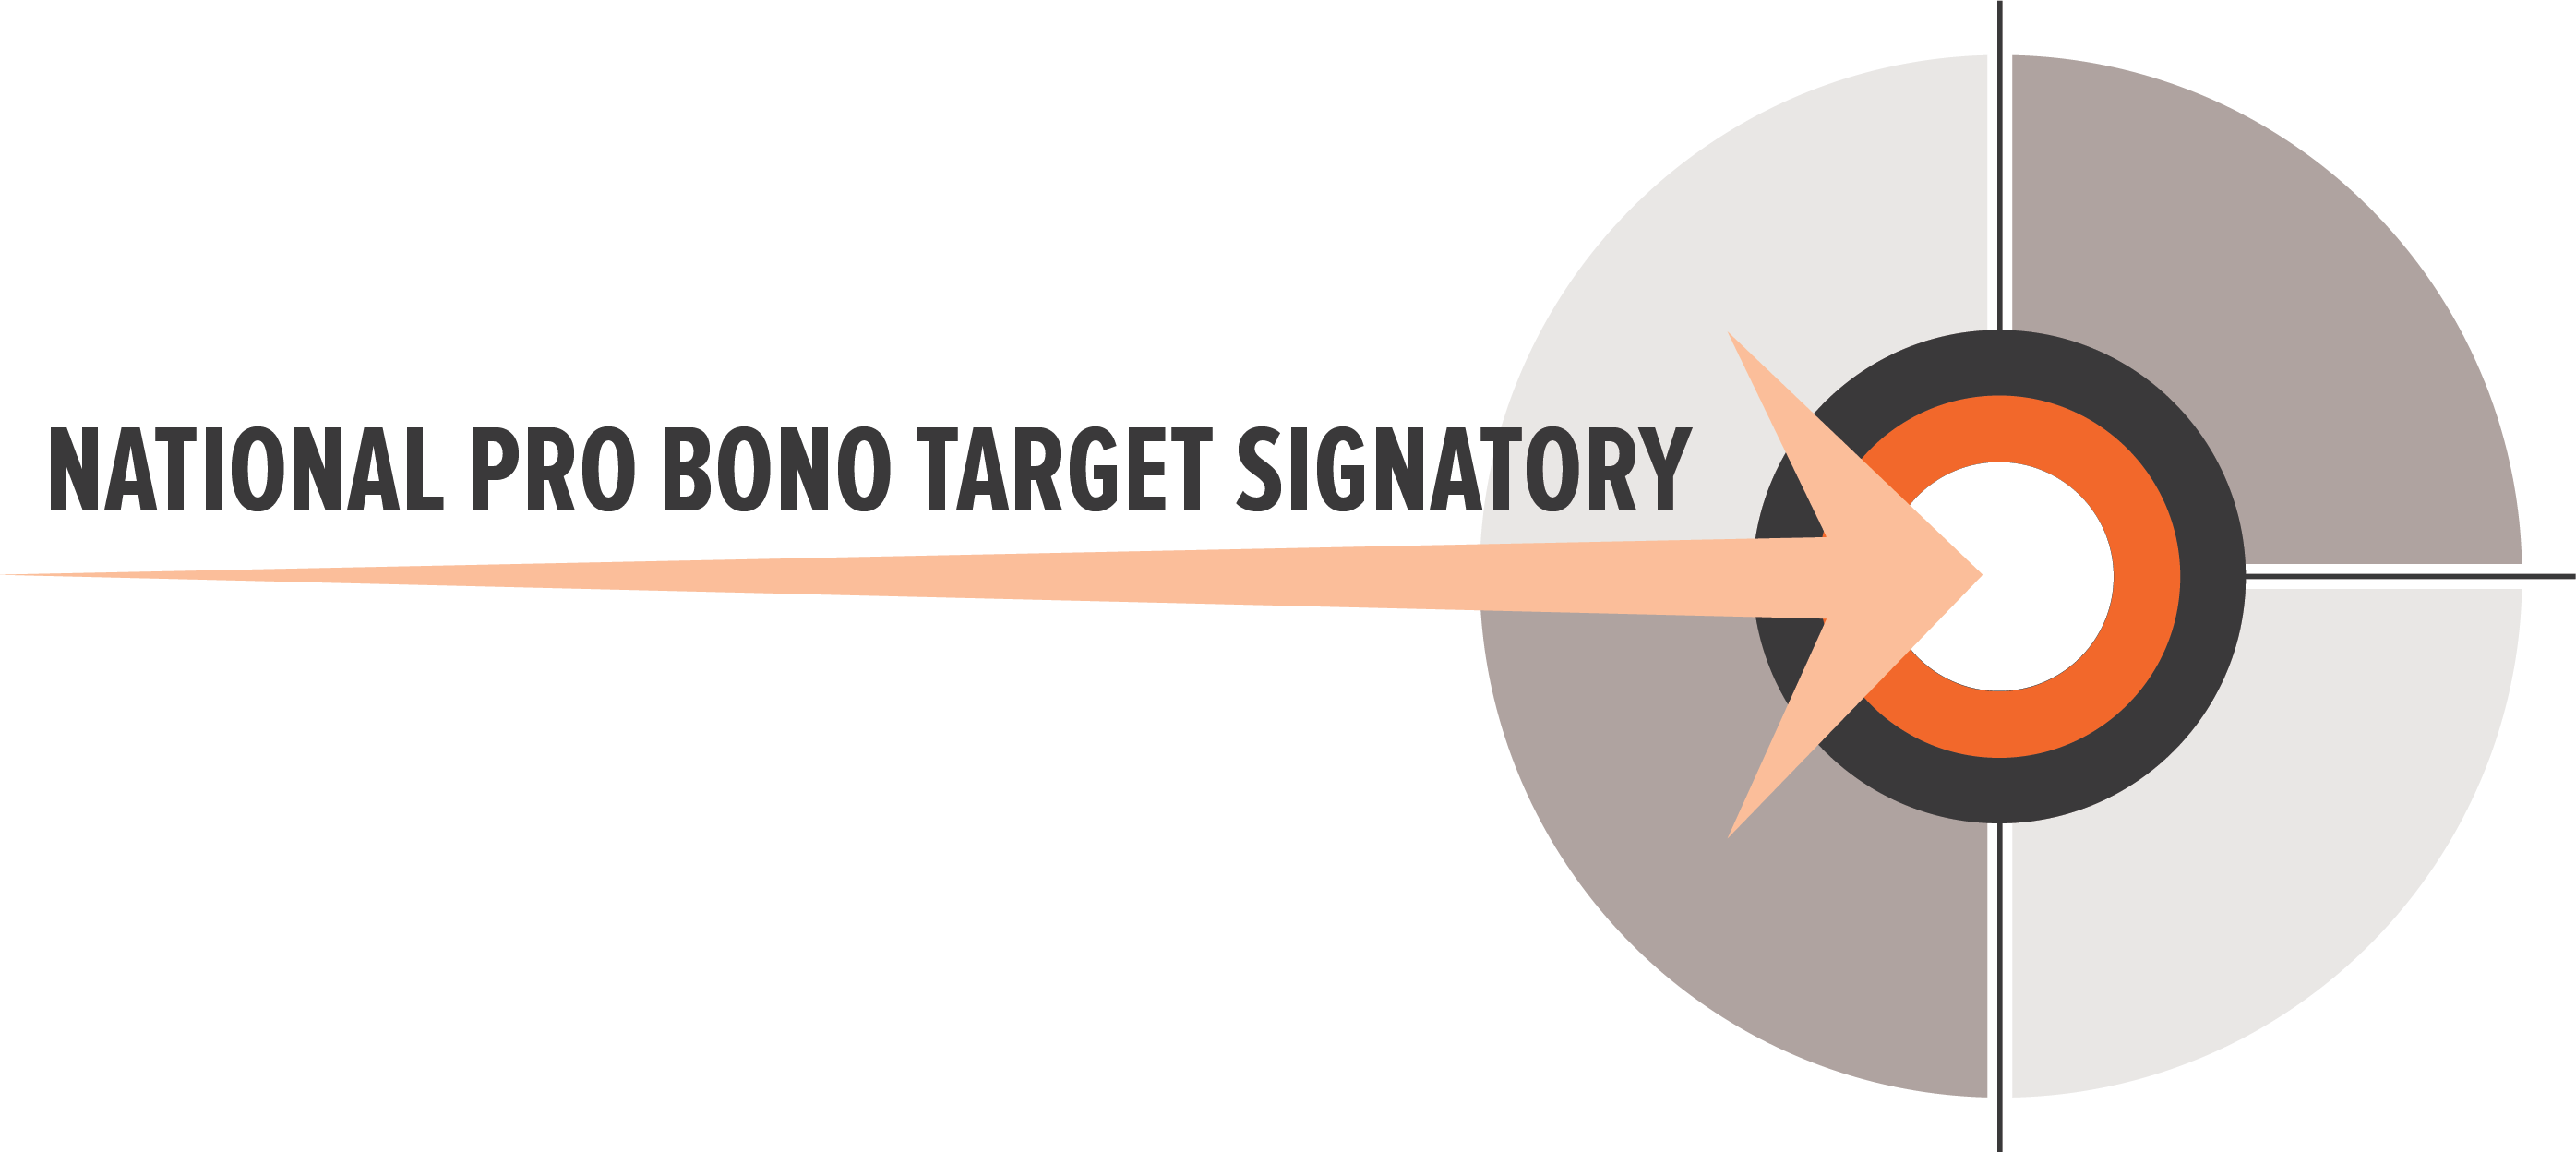 Australian Pro Bono Centre National Pro Bono Target